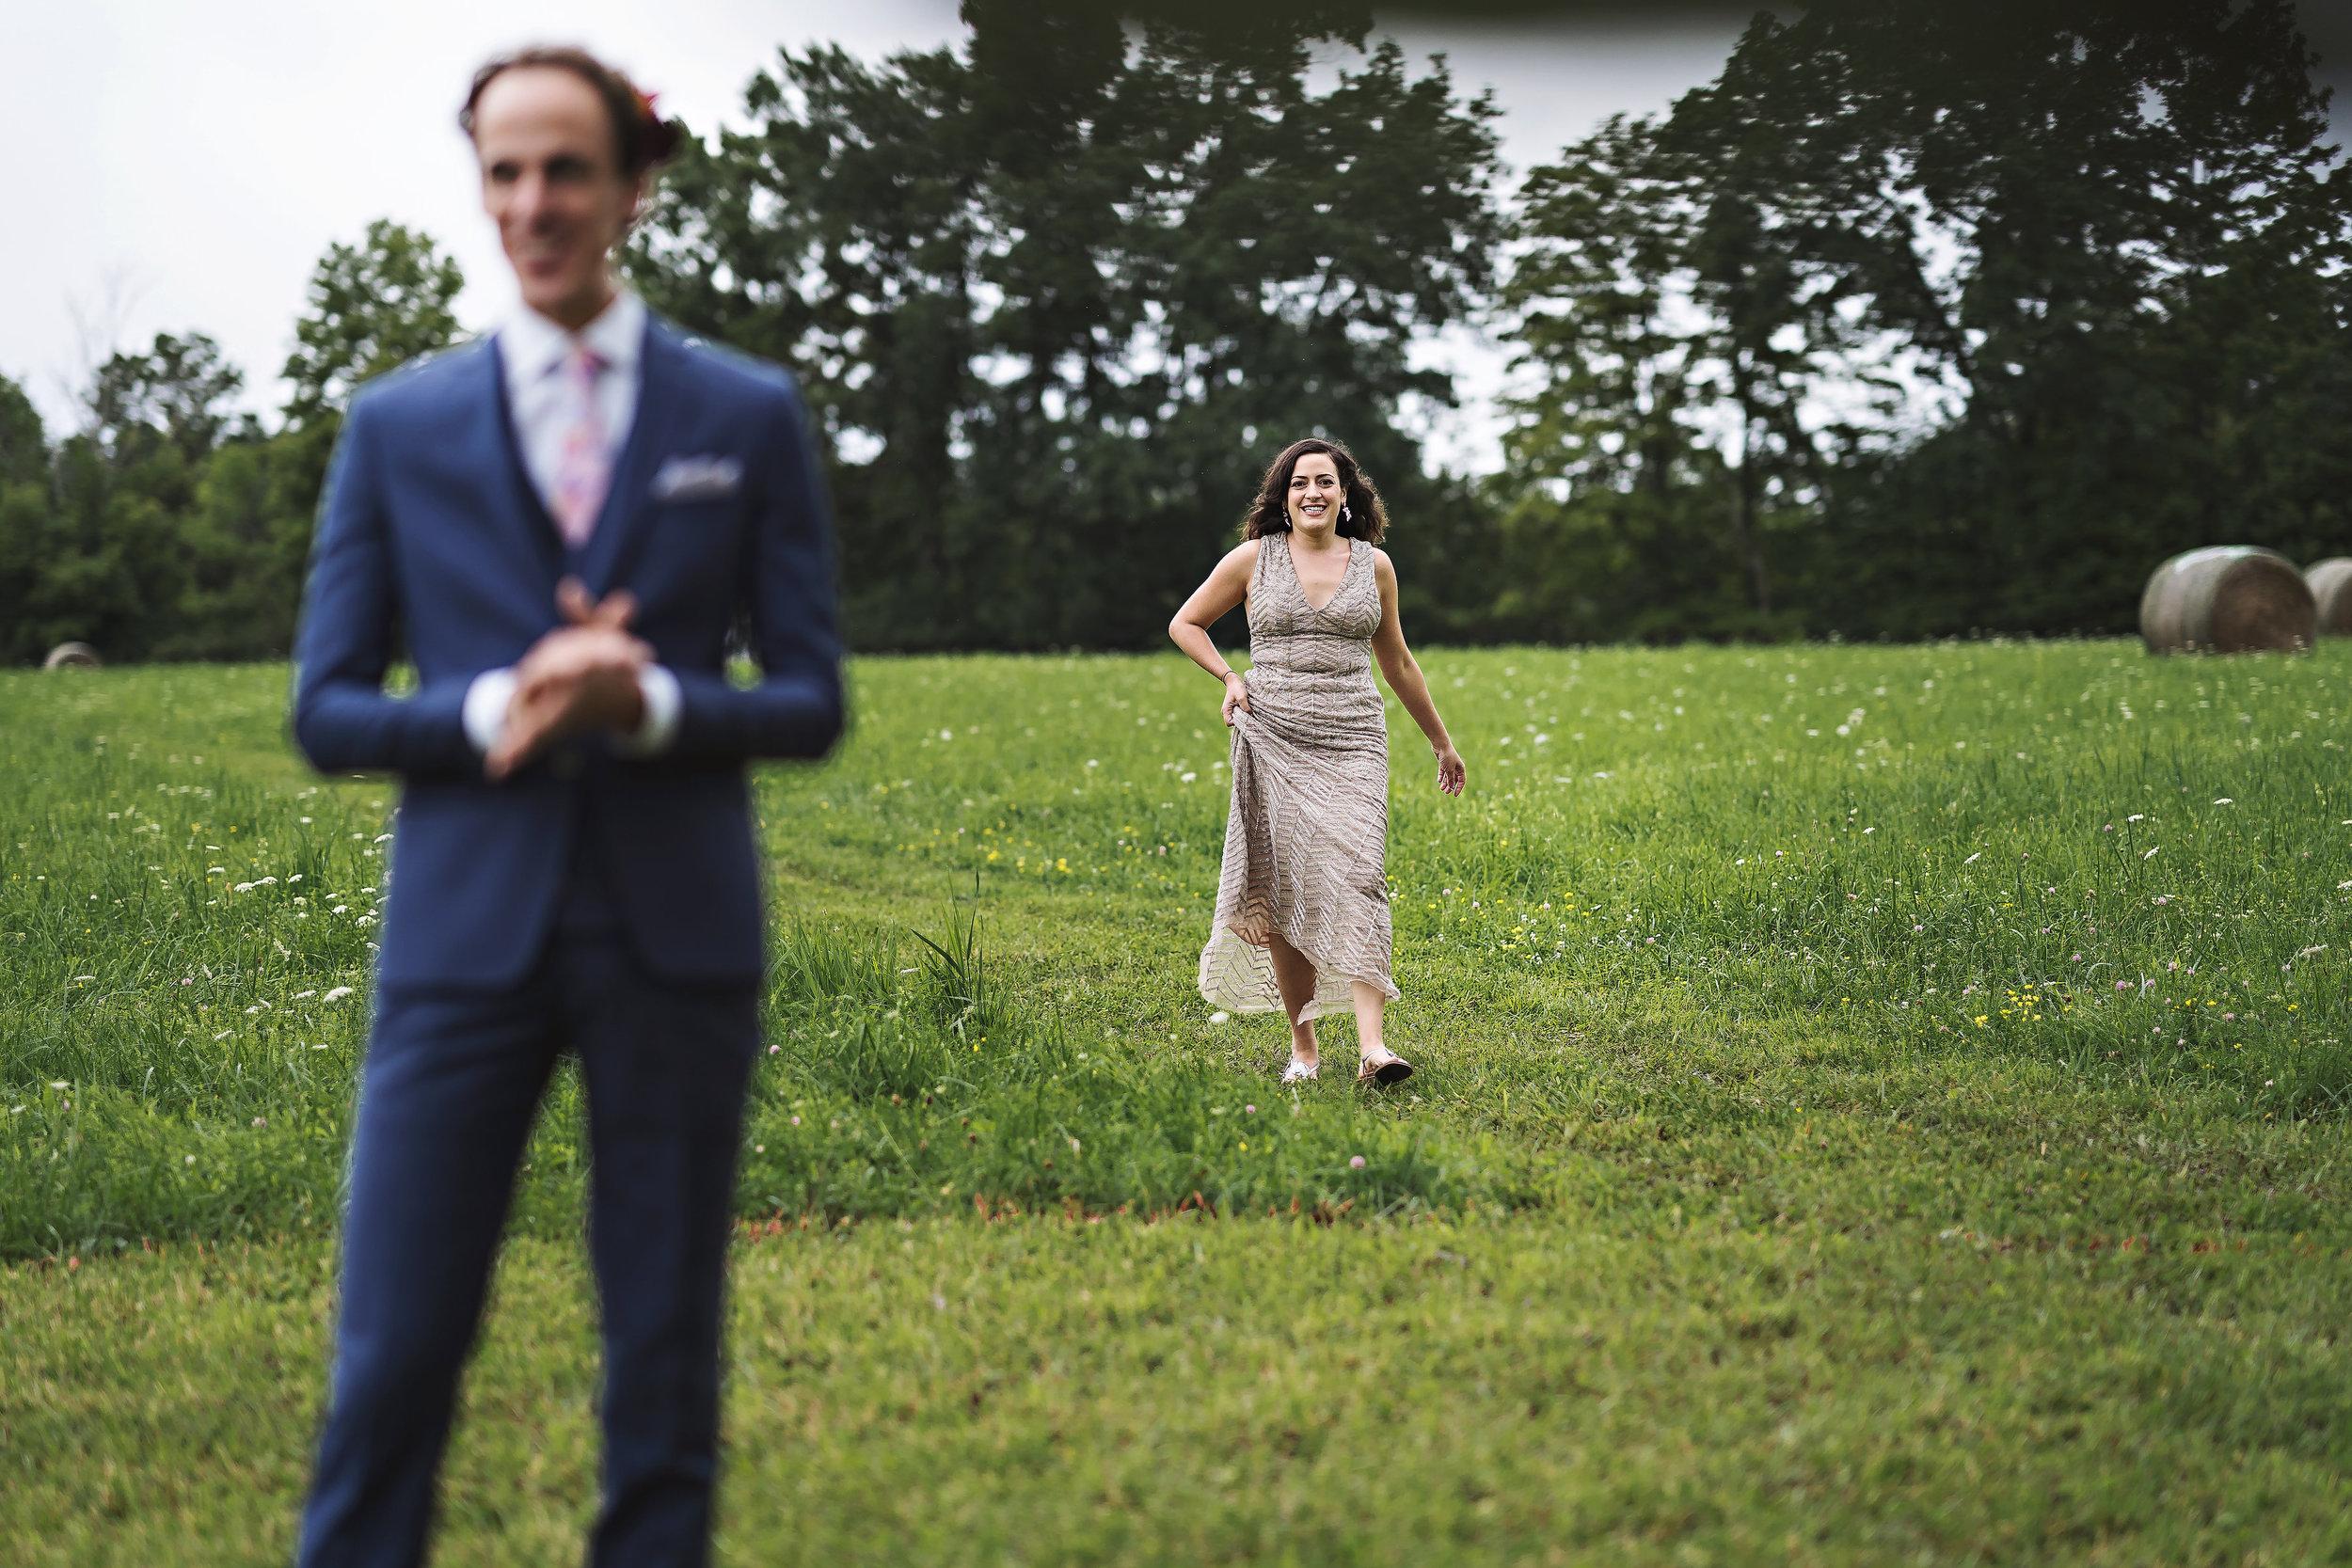 upstate-ny-wedding-jove-meyer-events-inbal-sivan-066.jpg